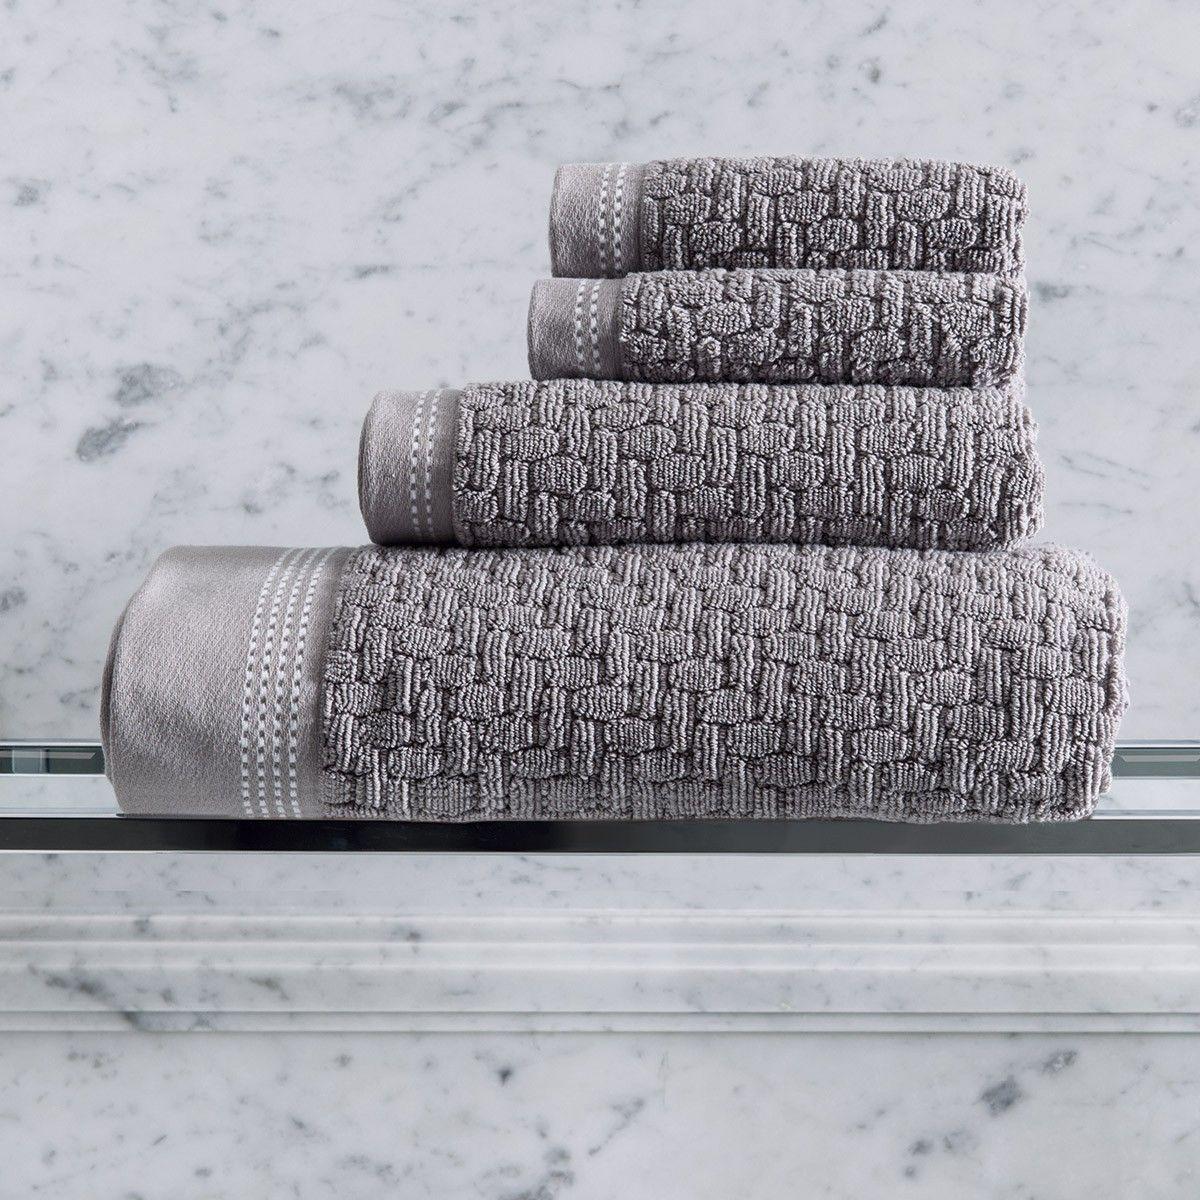 Bath Towel Couture Felt Grey 100 Cotton Banyo Havlulari